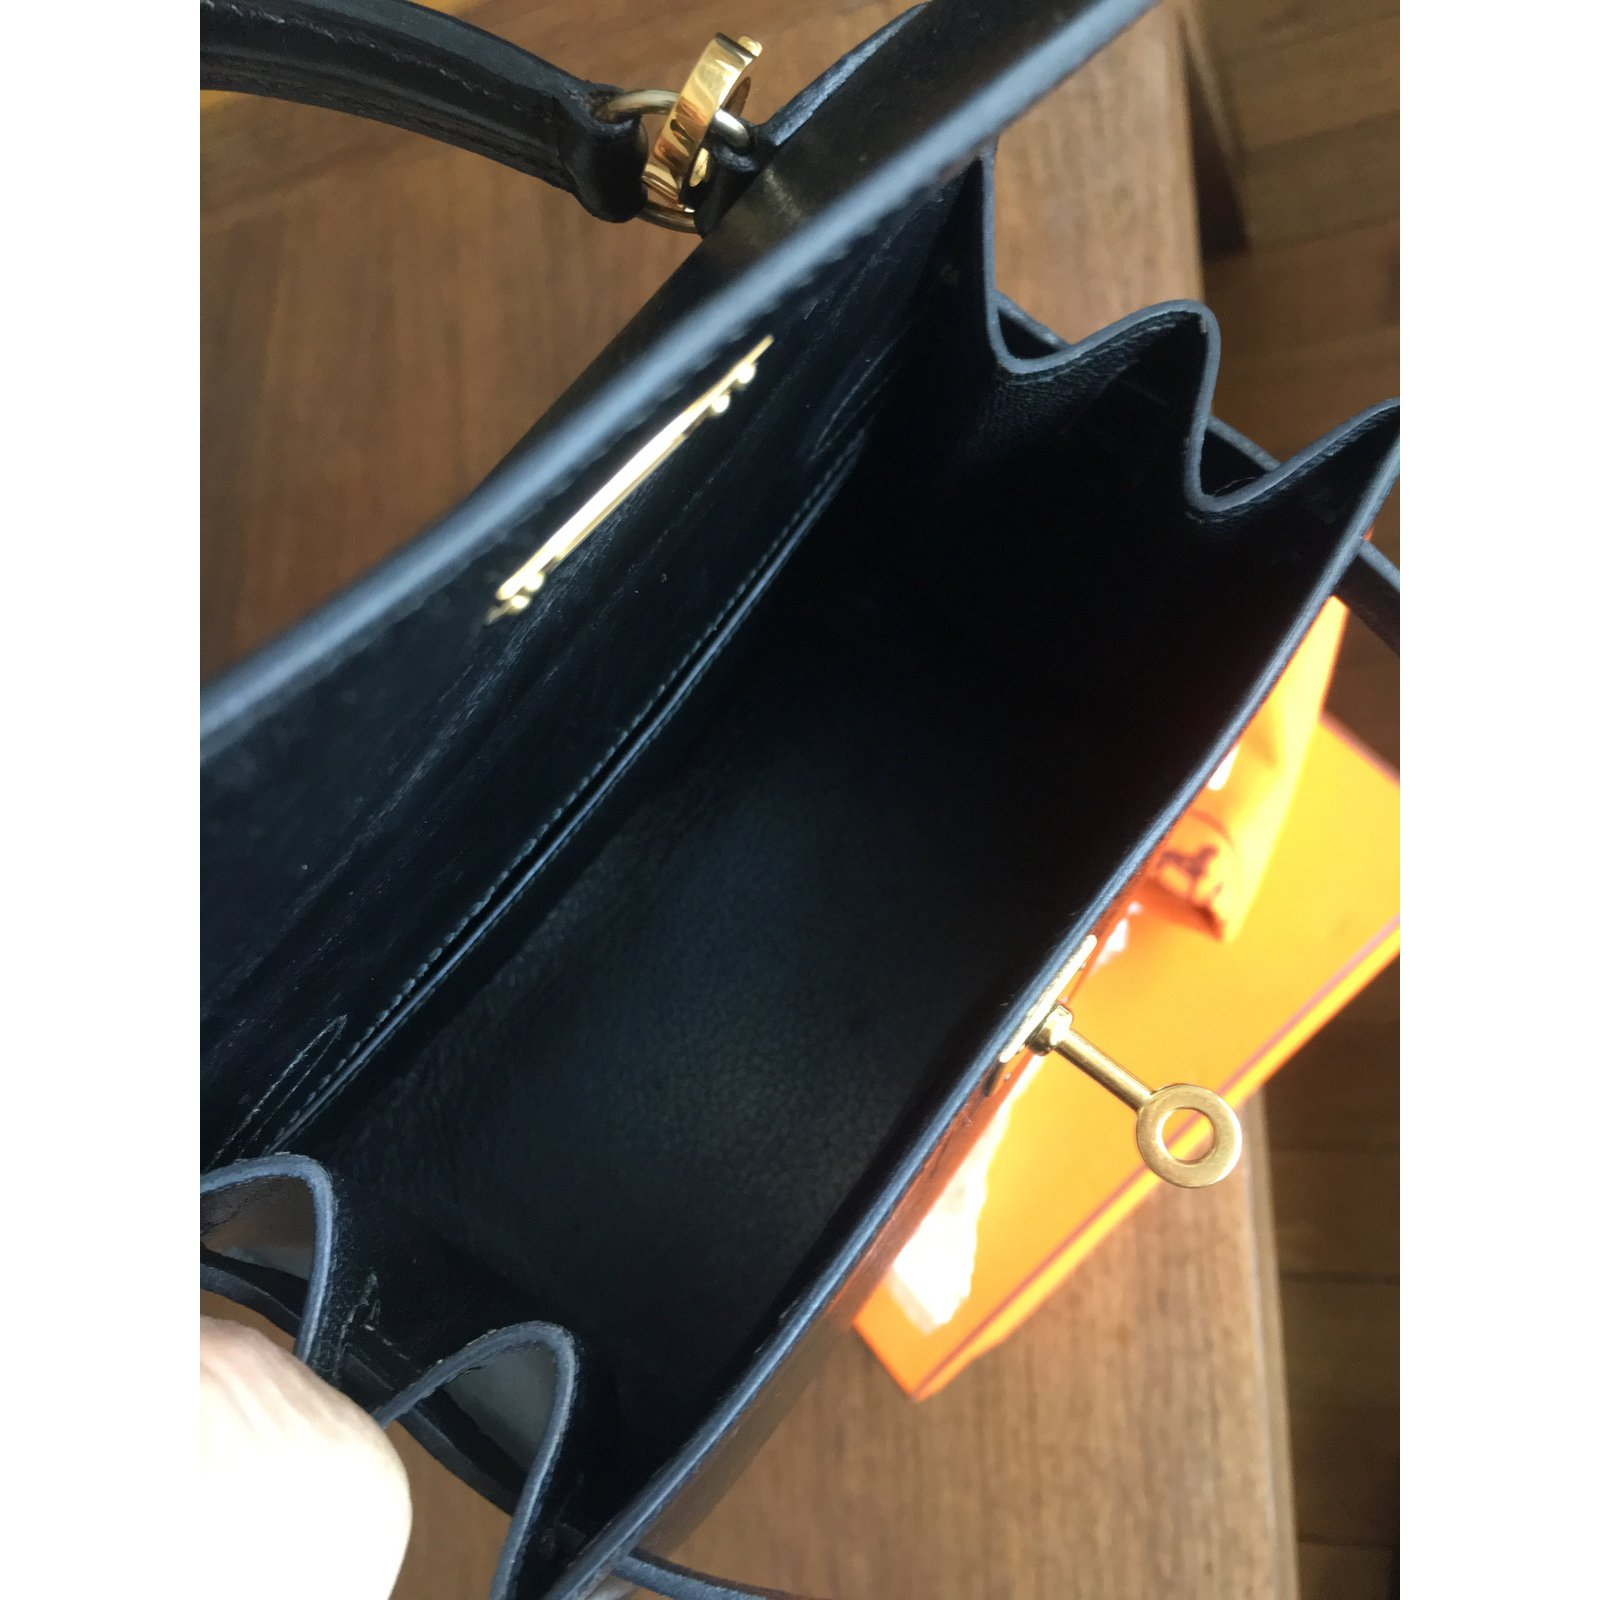 6b897018191b6 Sacs à main Hermès Très rare sac HERMES Kelly Mini 20 cm Box noir Cuir Noir  ref.55883 - Joli Closet